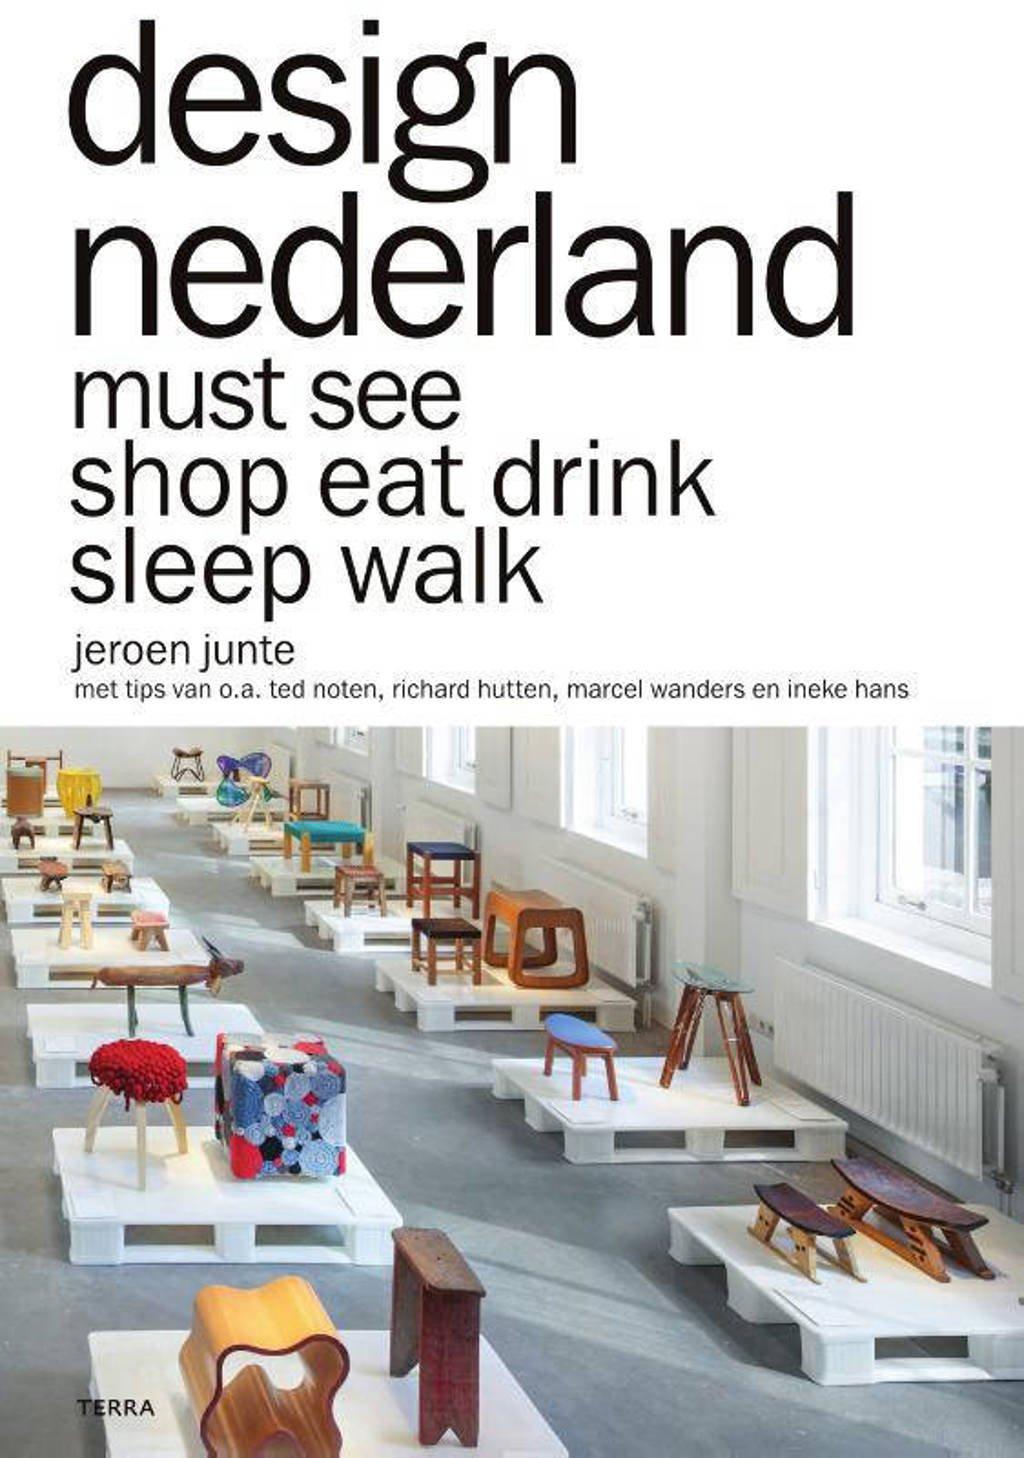 Design Nederland - Jeroen Junte